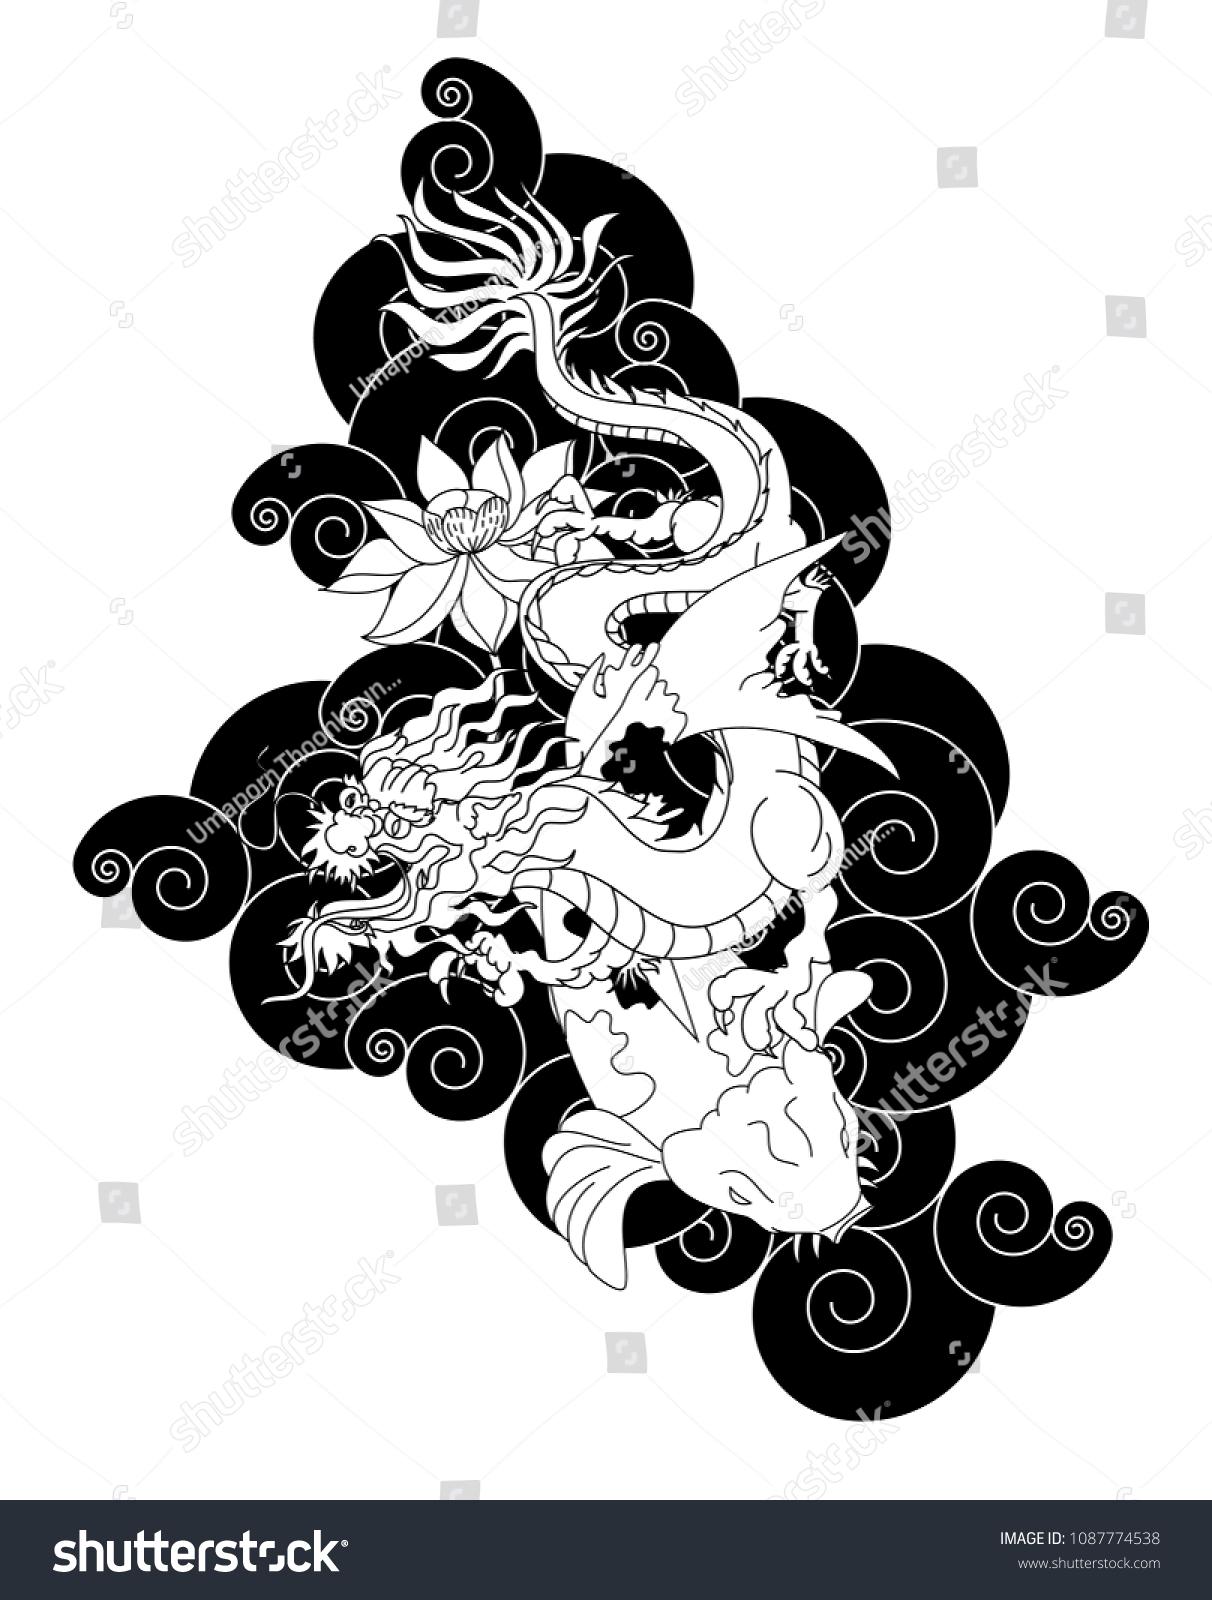 Japanese dragon koi carp lotus flower stock vector 1087774538 japanese dragon and koi carp with lotus flower on cloud backgroundlorful chinese tattoo design izmirmasajfo